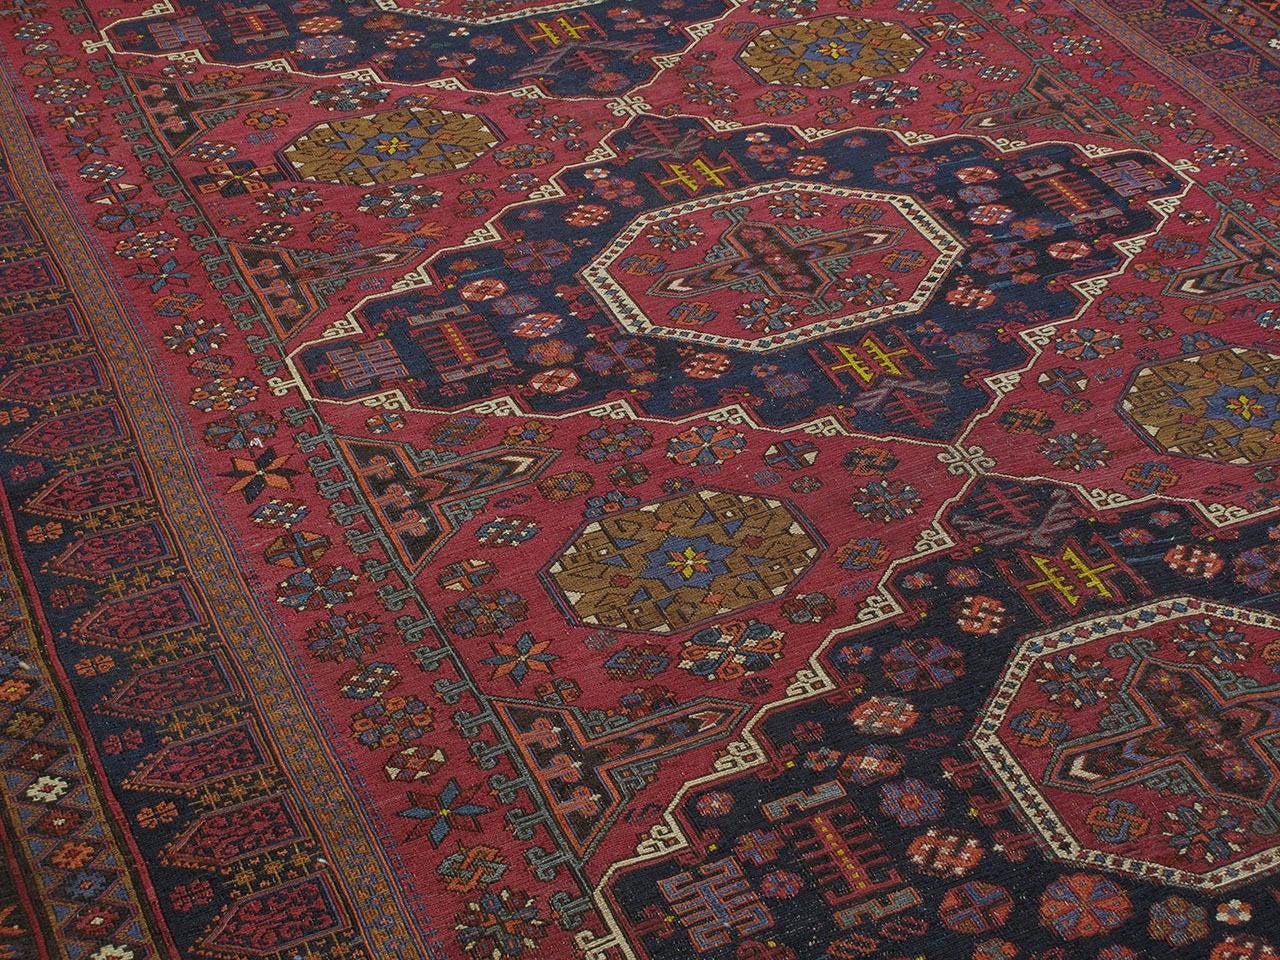 Azerbaijani Sumak Carpet For Sale